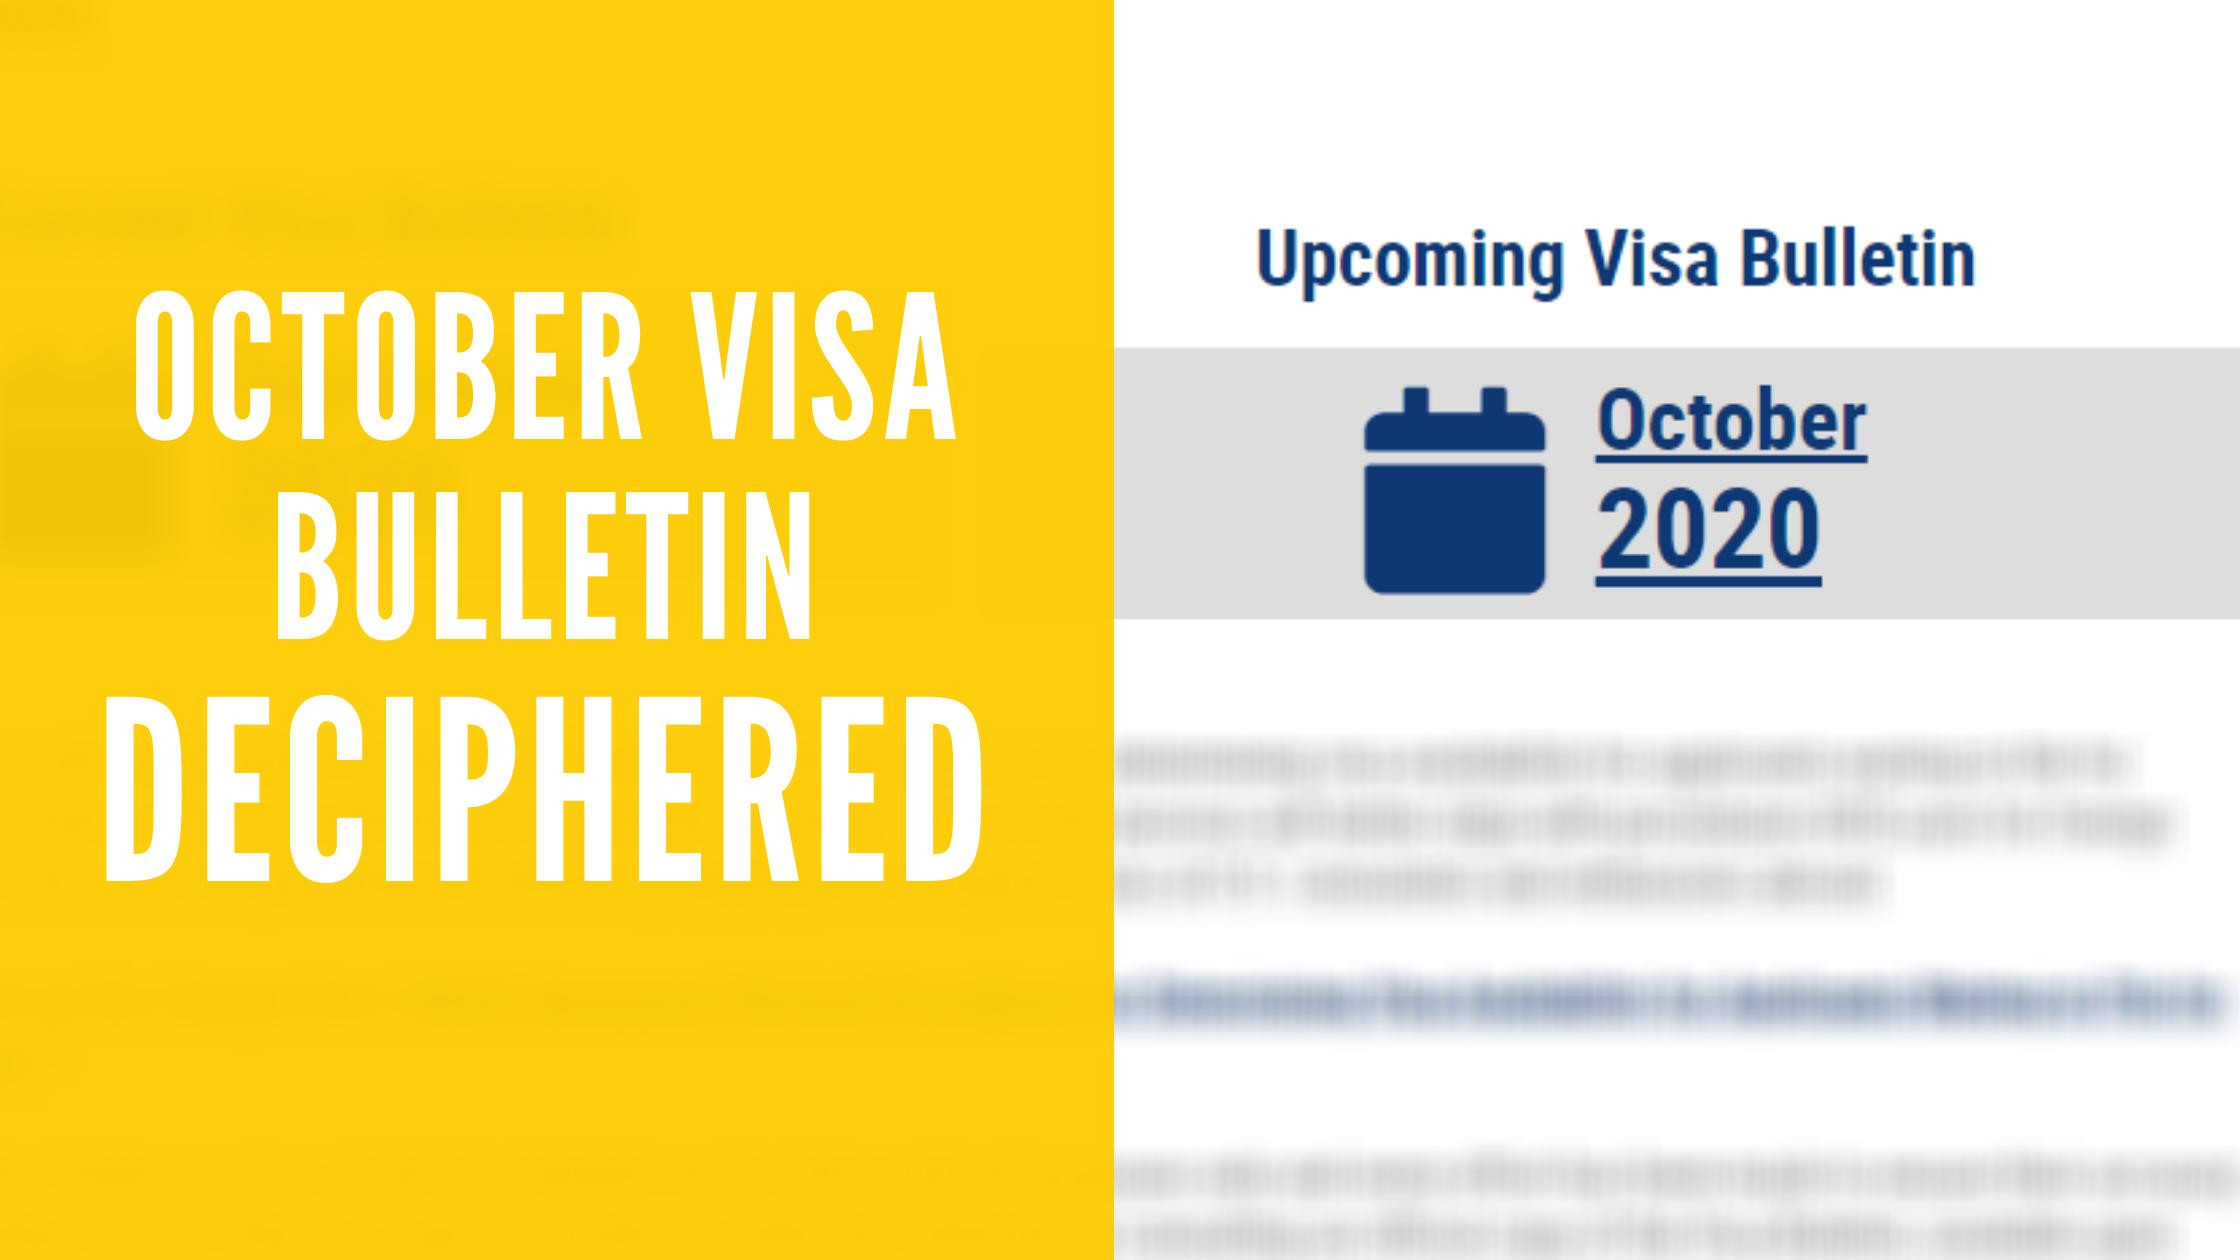 Deciphering the October 2020 Visa Bulletin